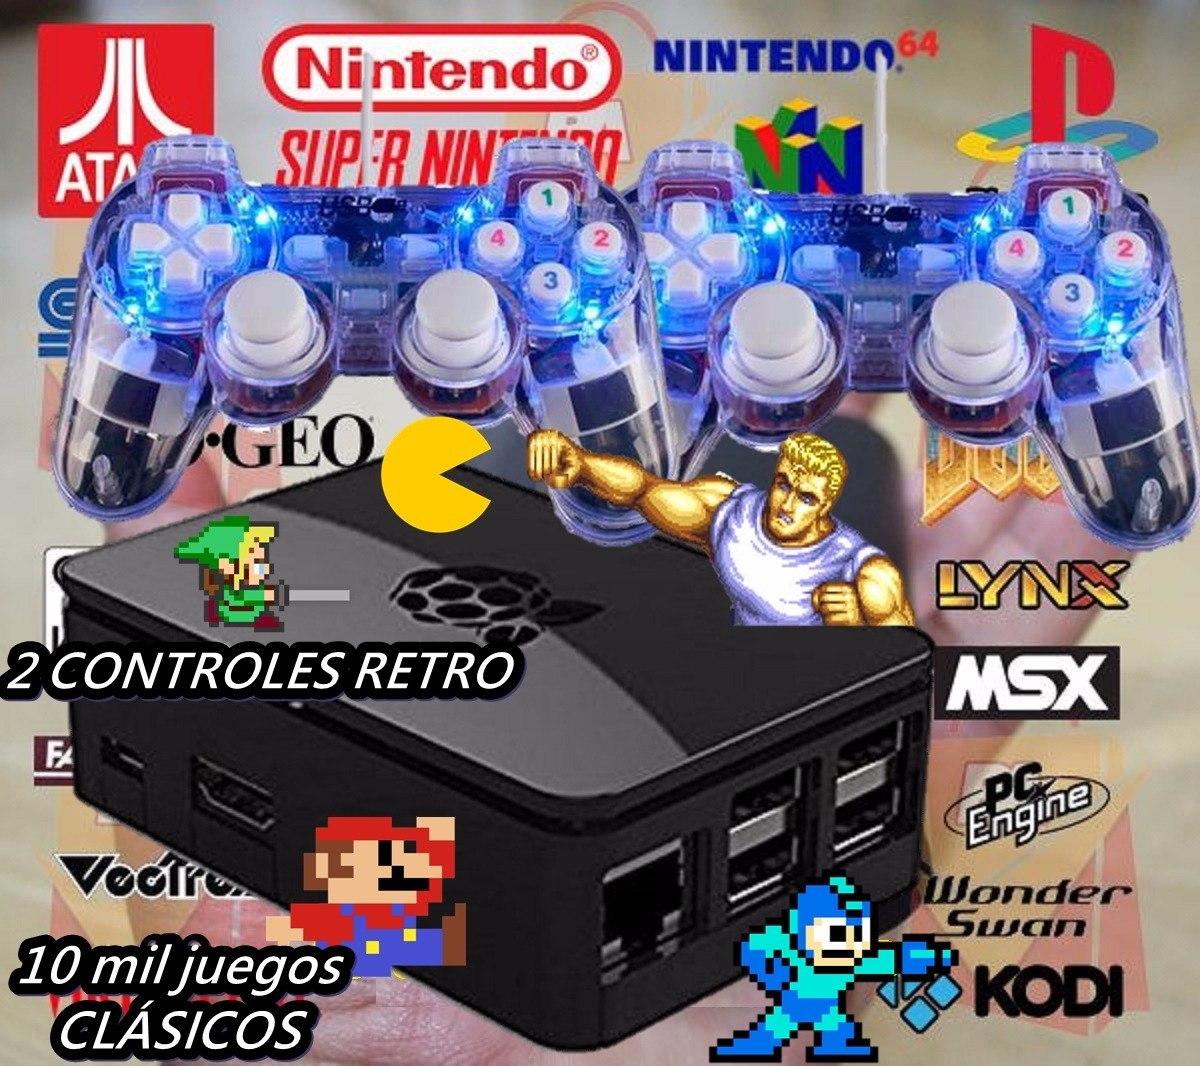 Emuladora 10 Mil Juegos Maquinitas 2 Controles Inalambricos